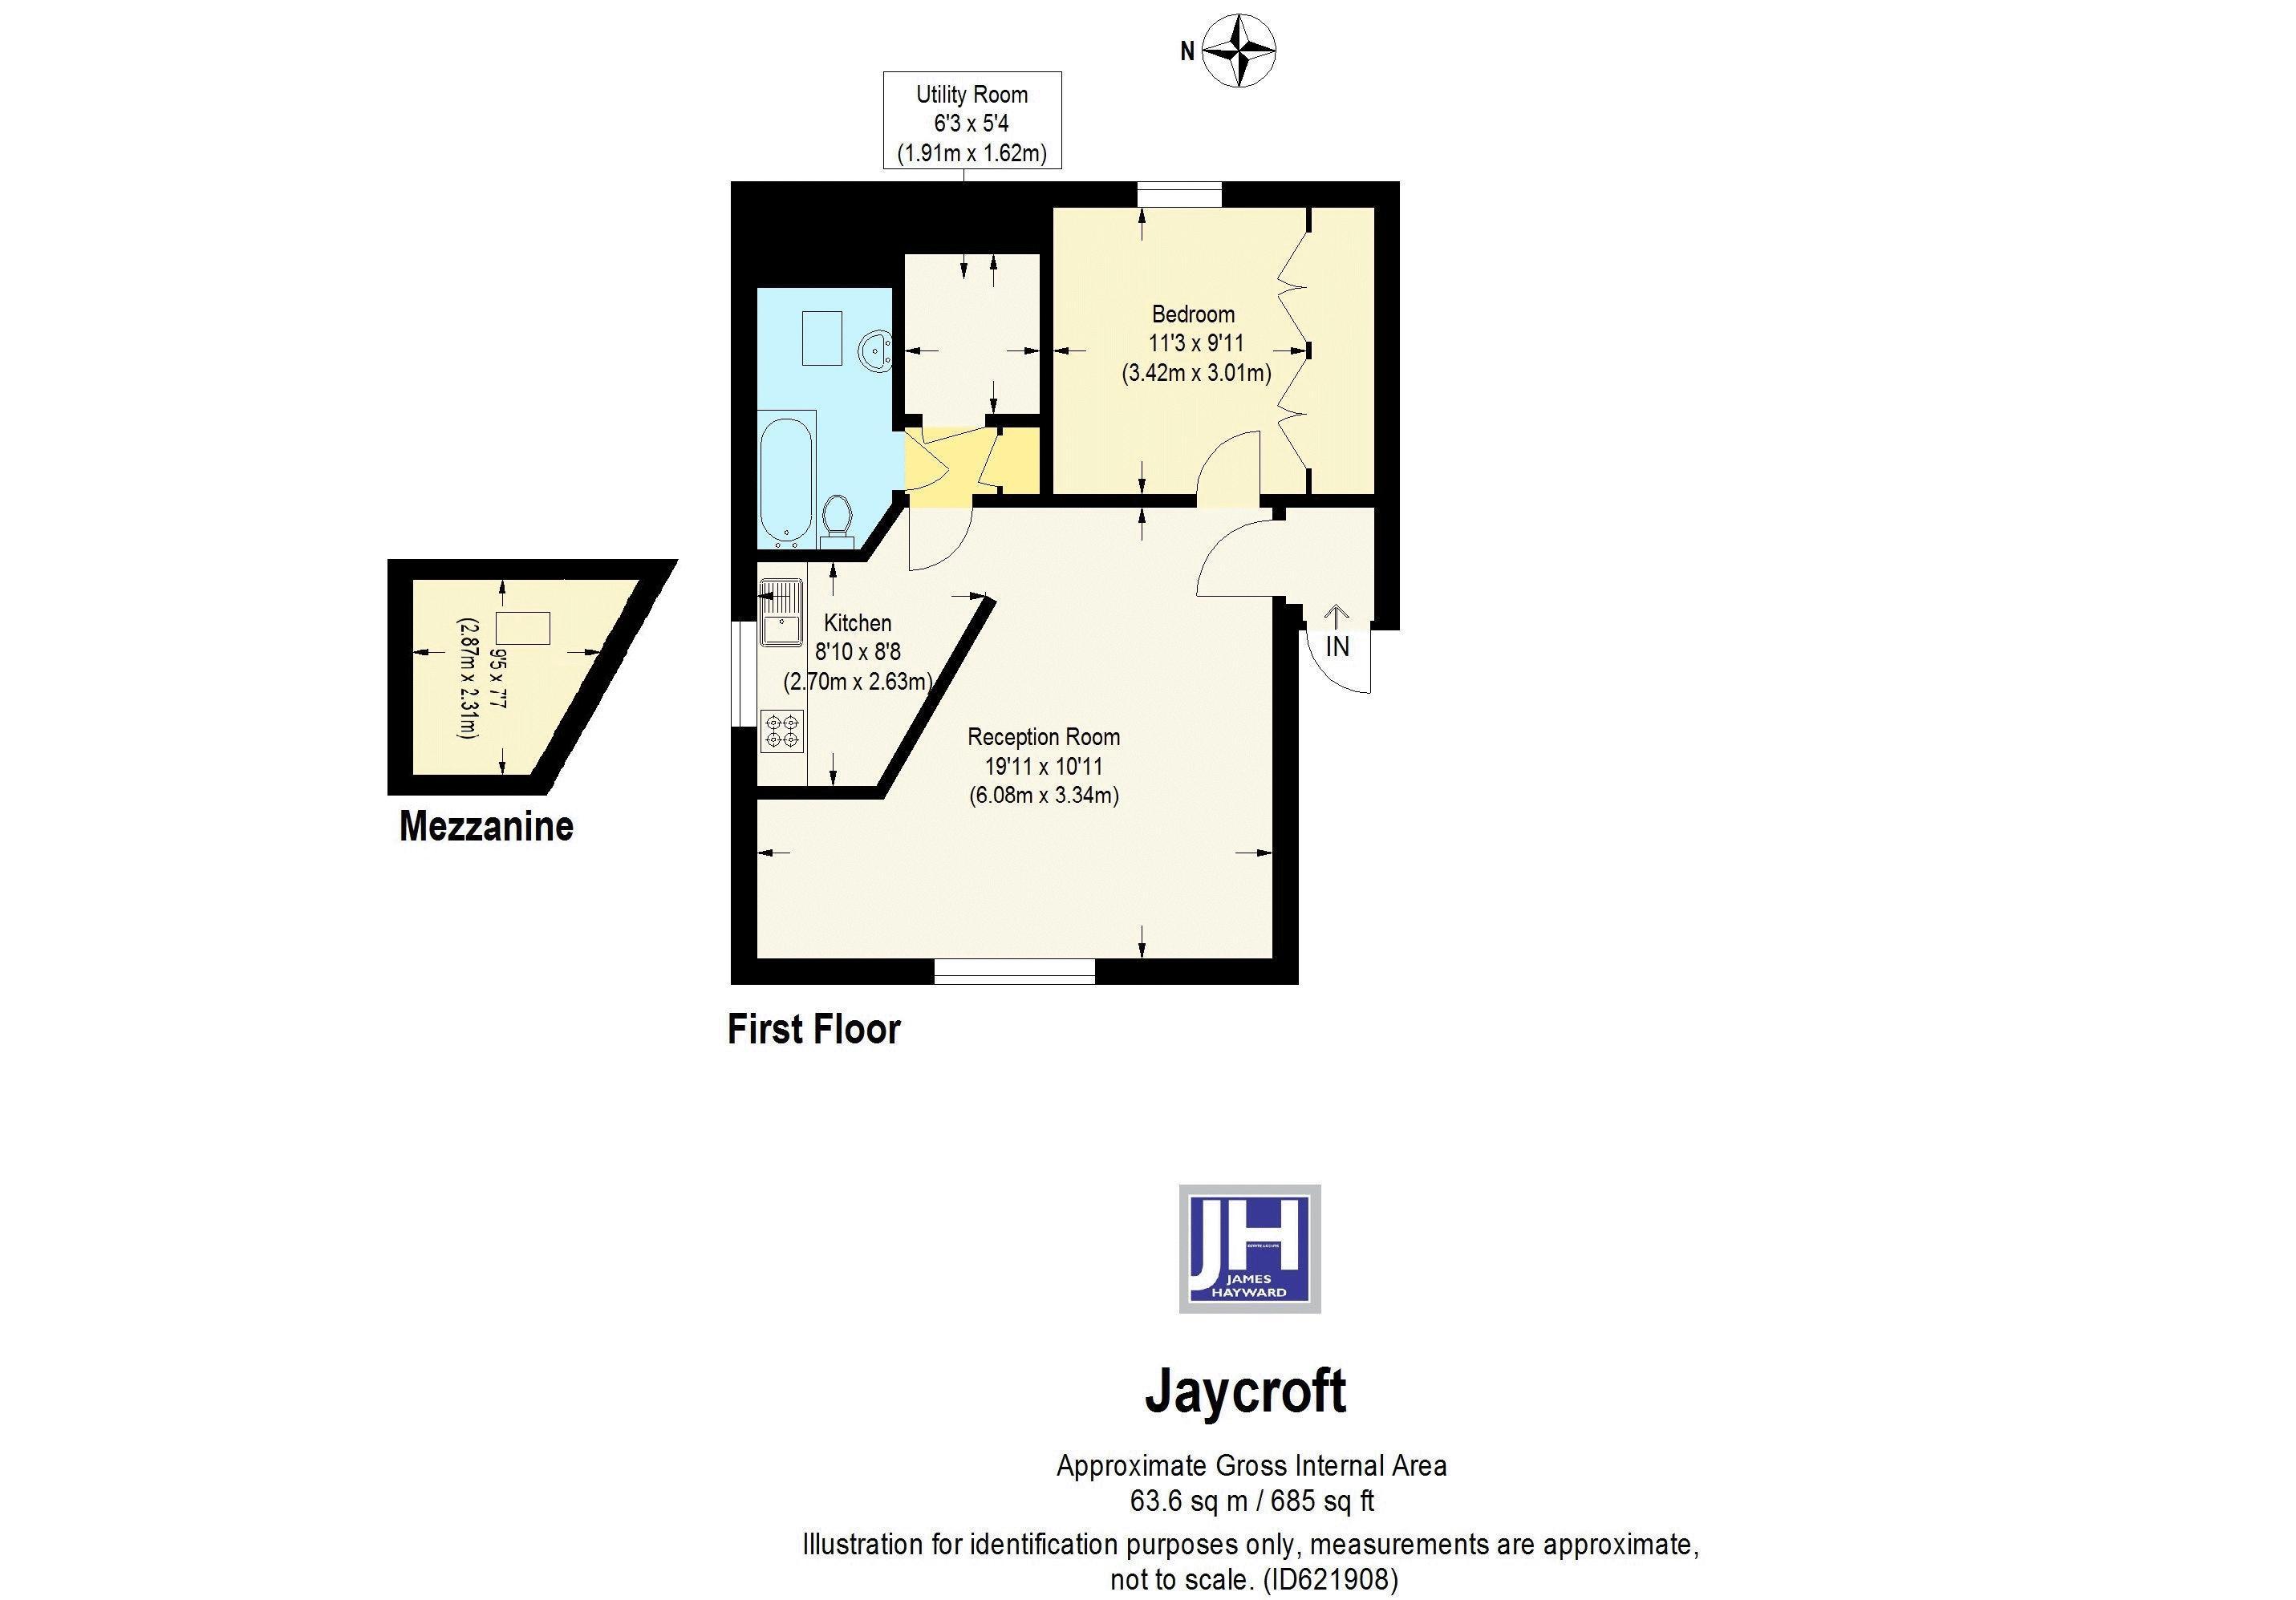 Jaycroft